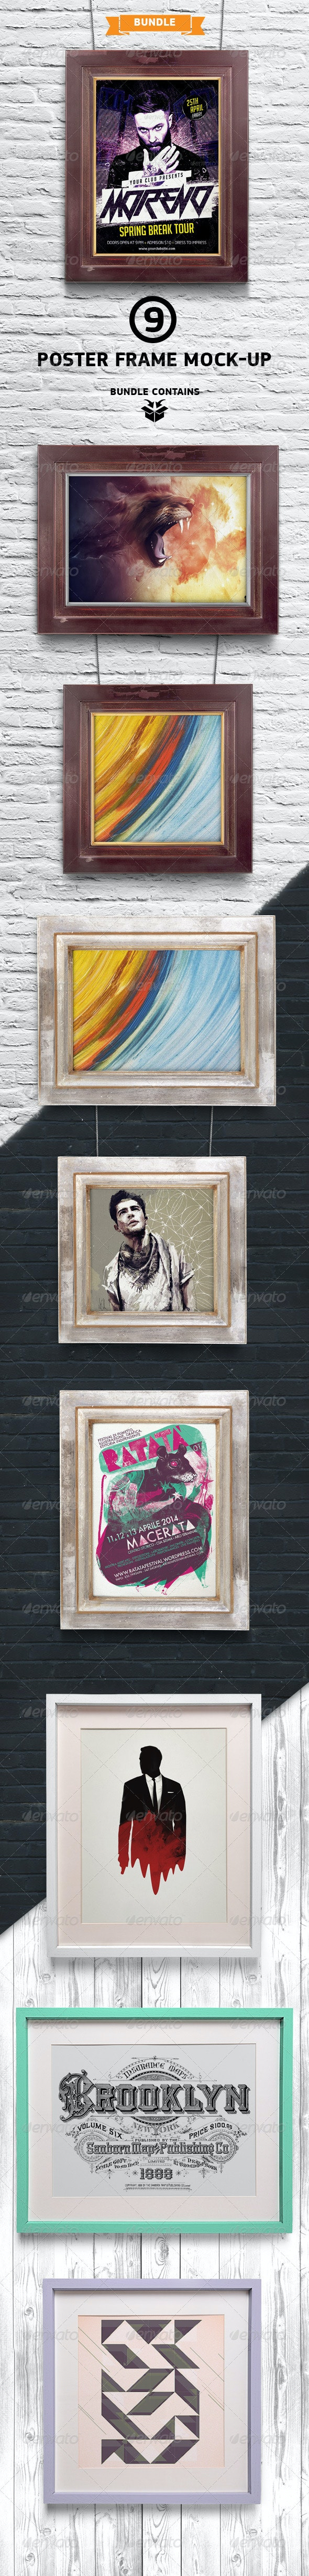 Poster / Picture Frame Mock-up Bundle - Posters Print